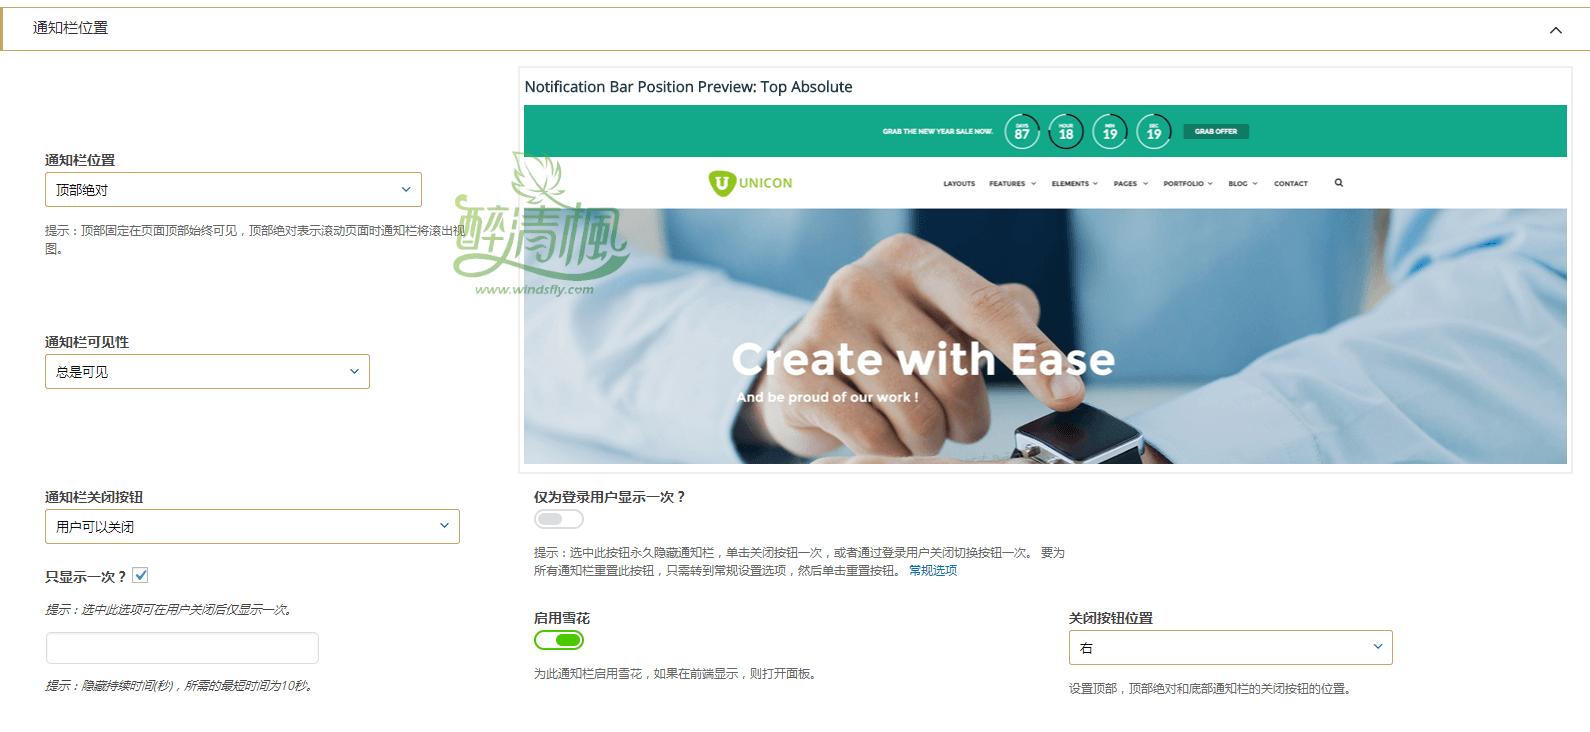 WordPress高级通知插件 - Apex Notification Bar(汉化)[更新至v2.1.1] WordPress插件 第5张